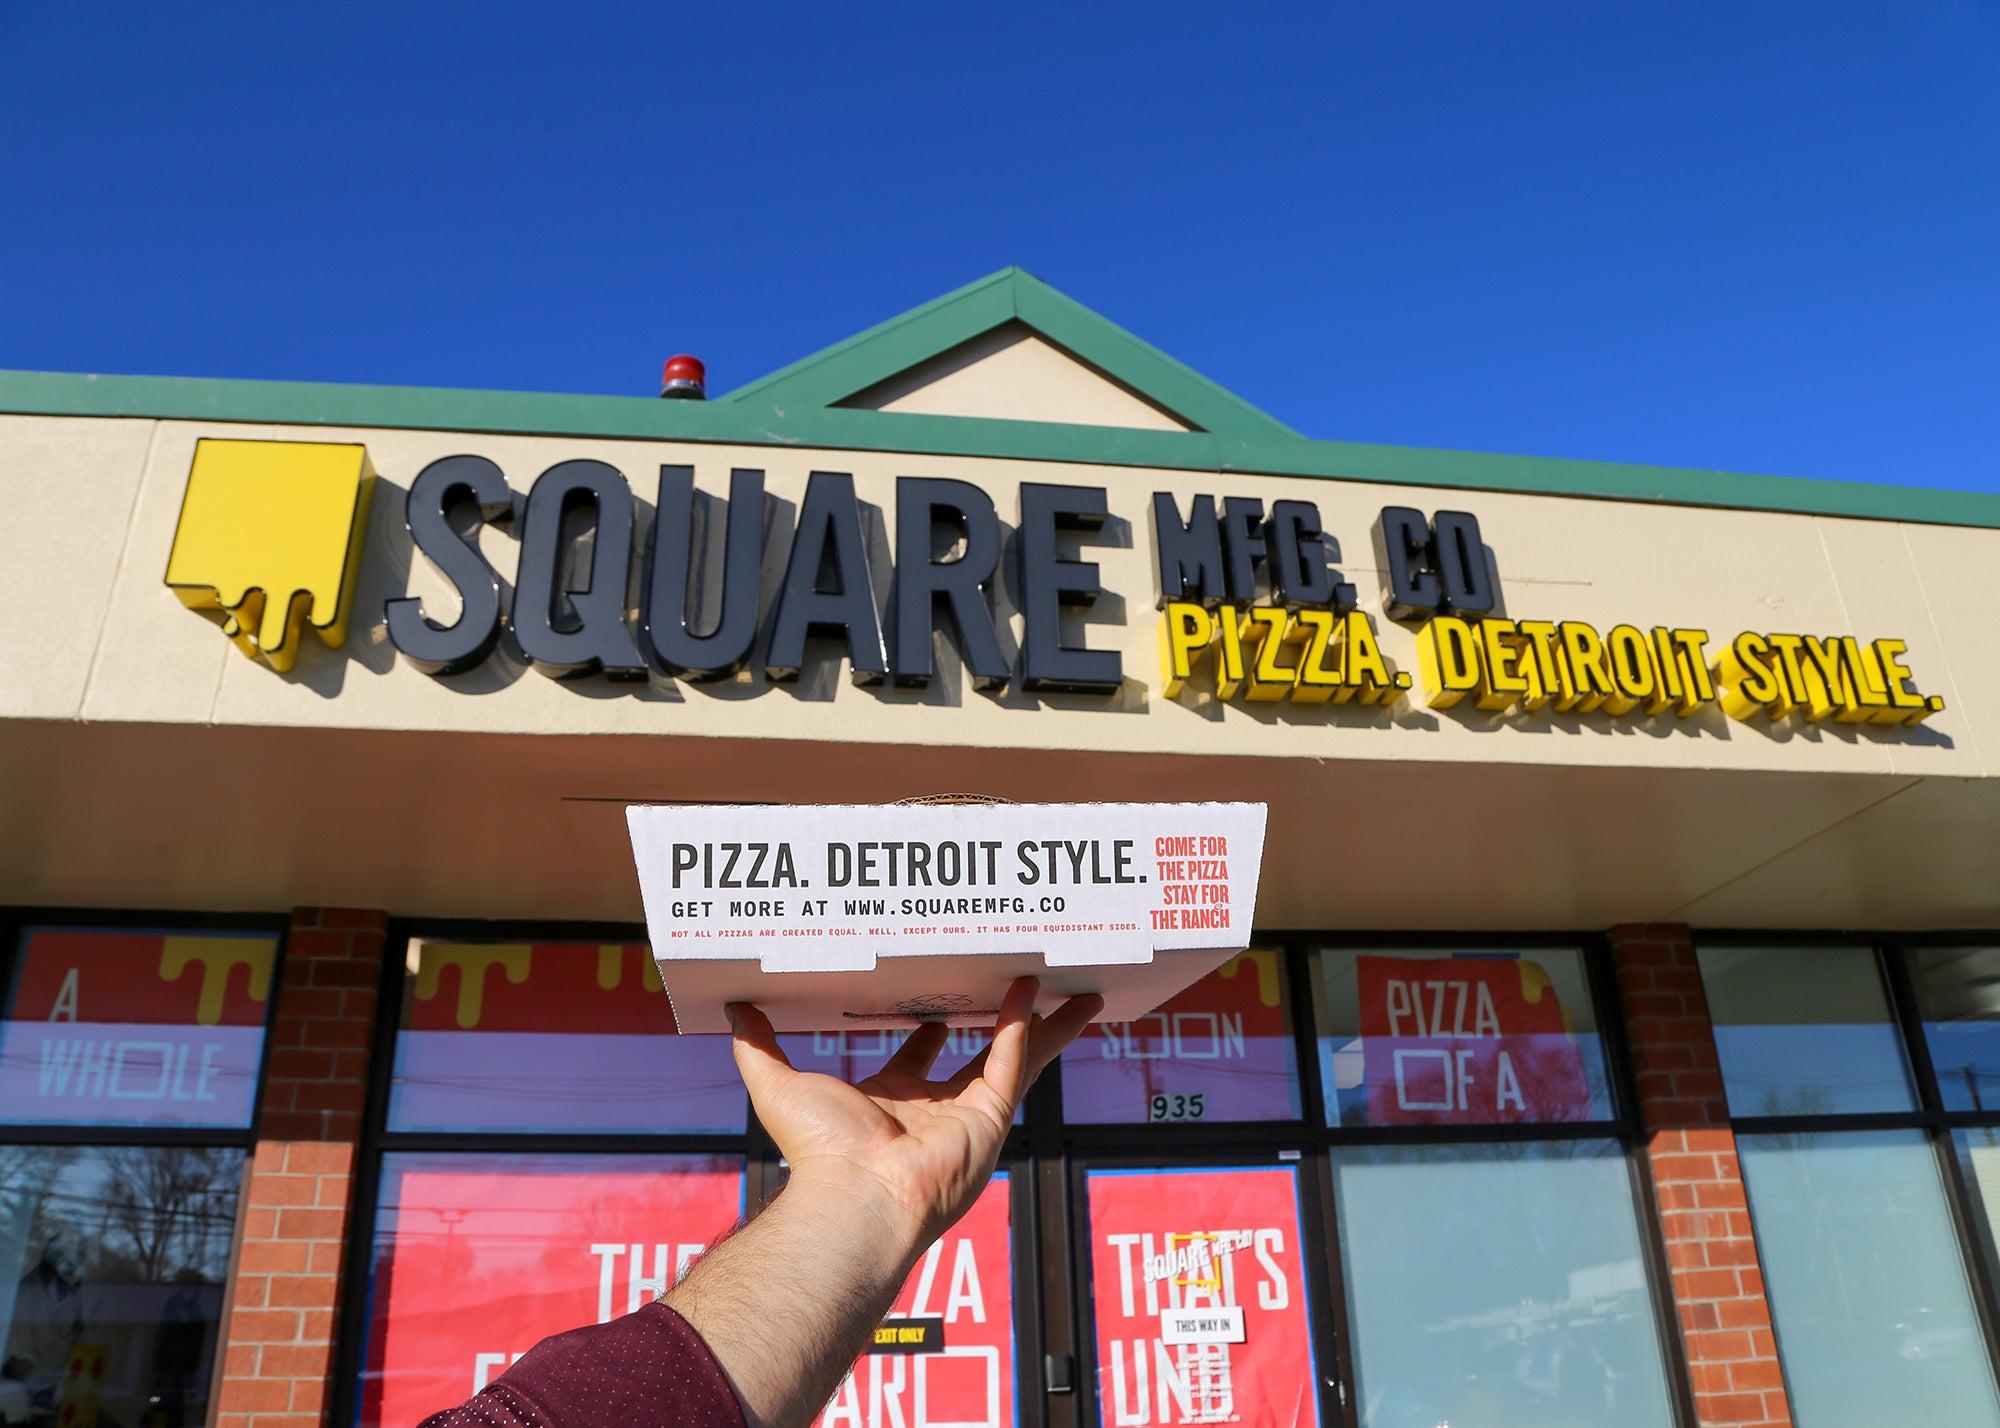 Square Mfg. Co. exterior